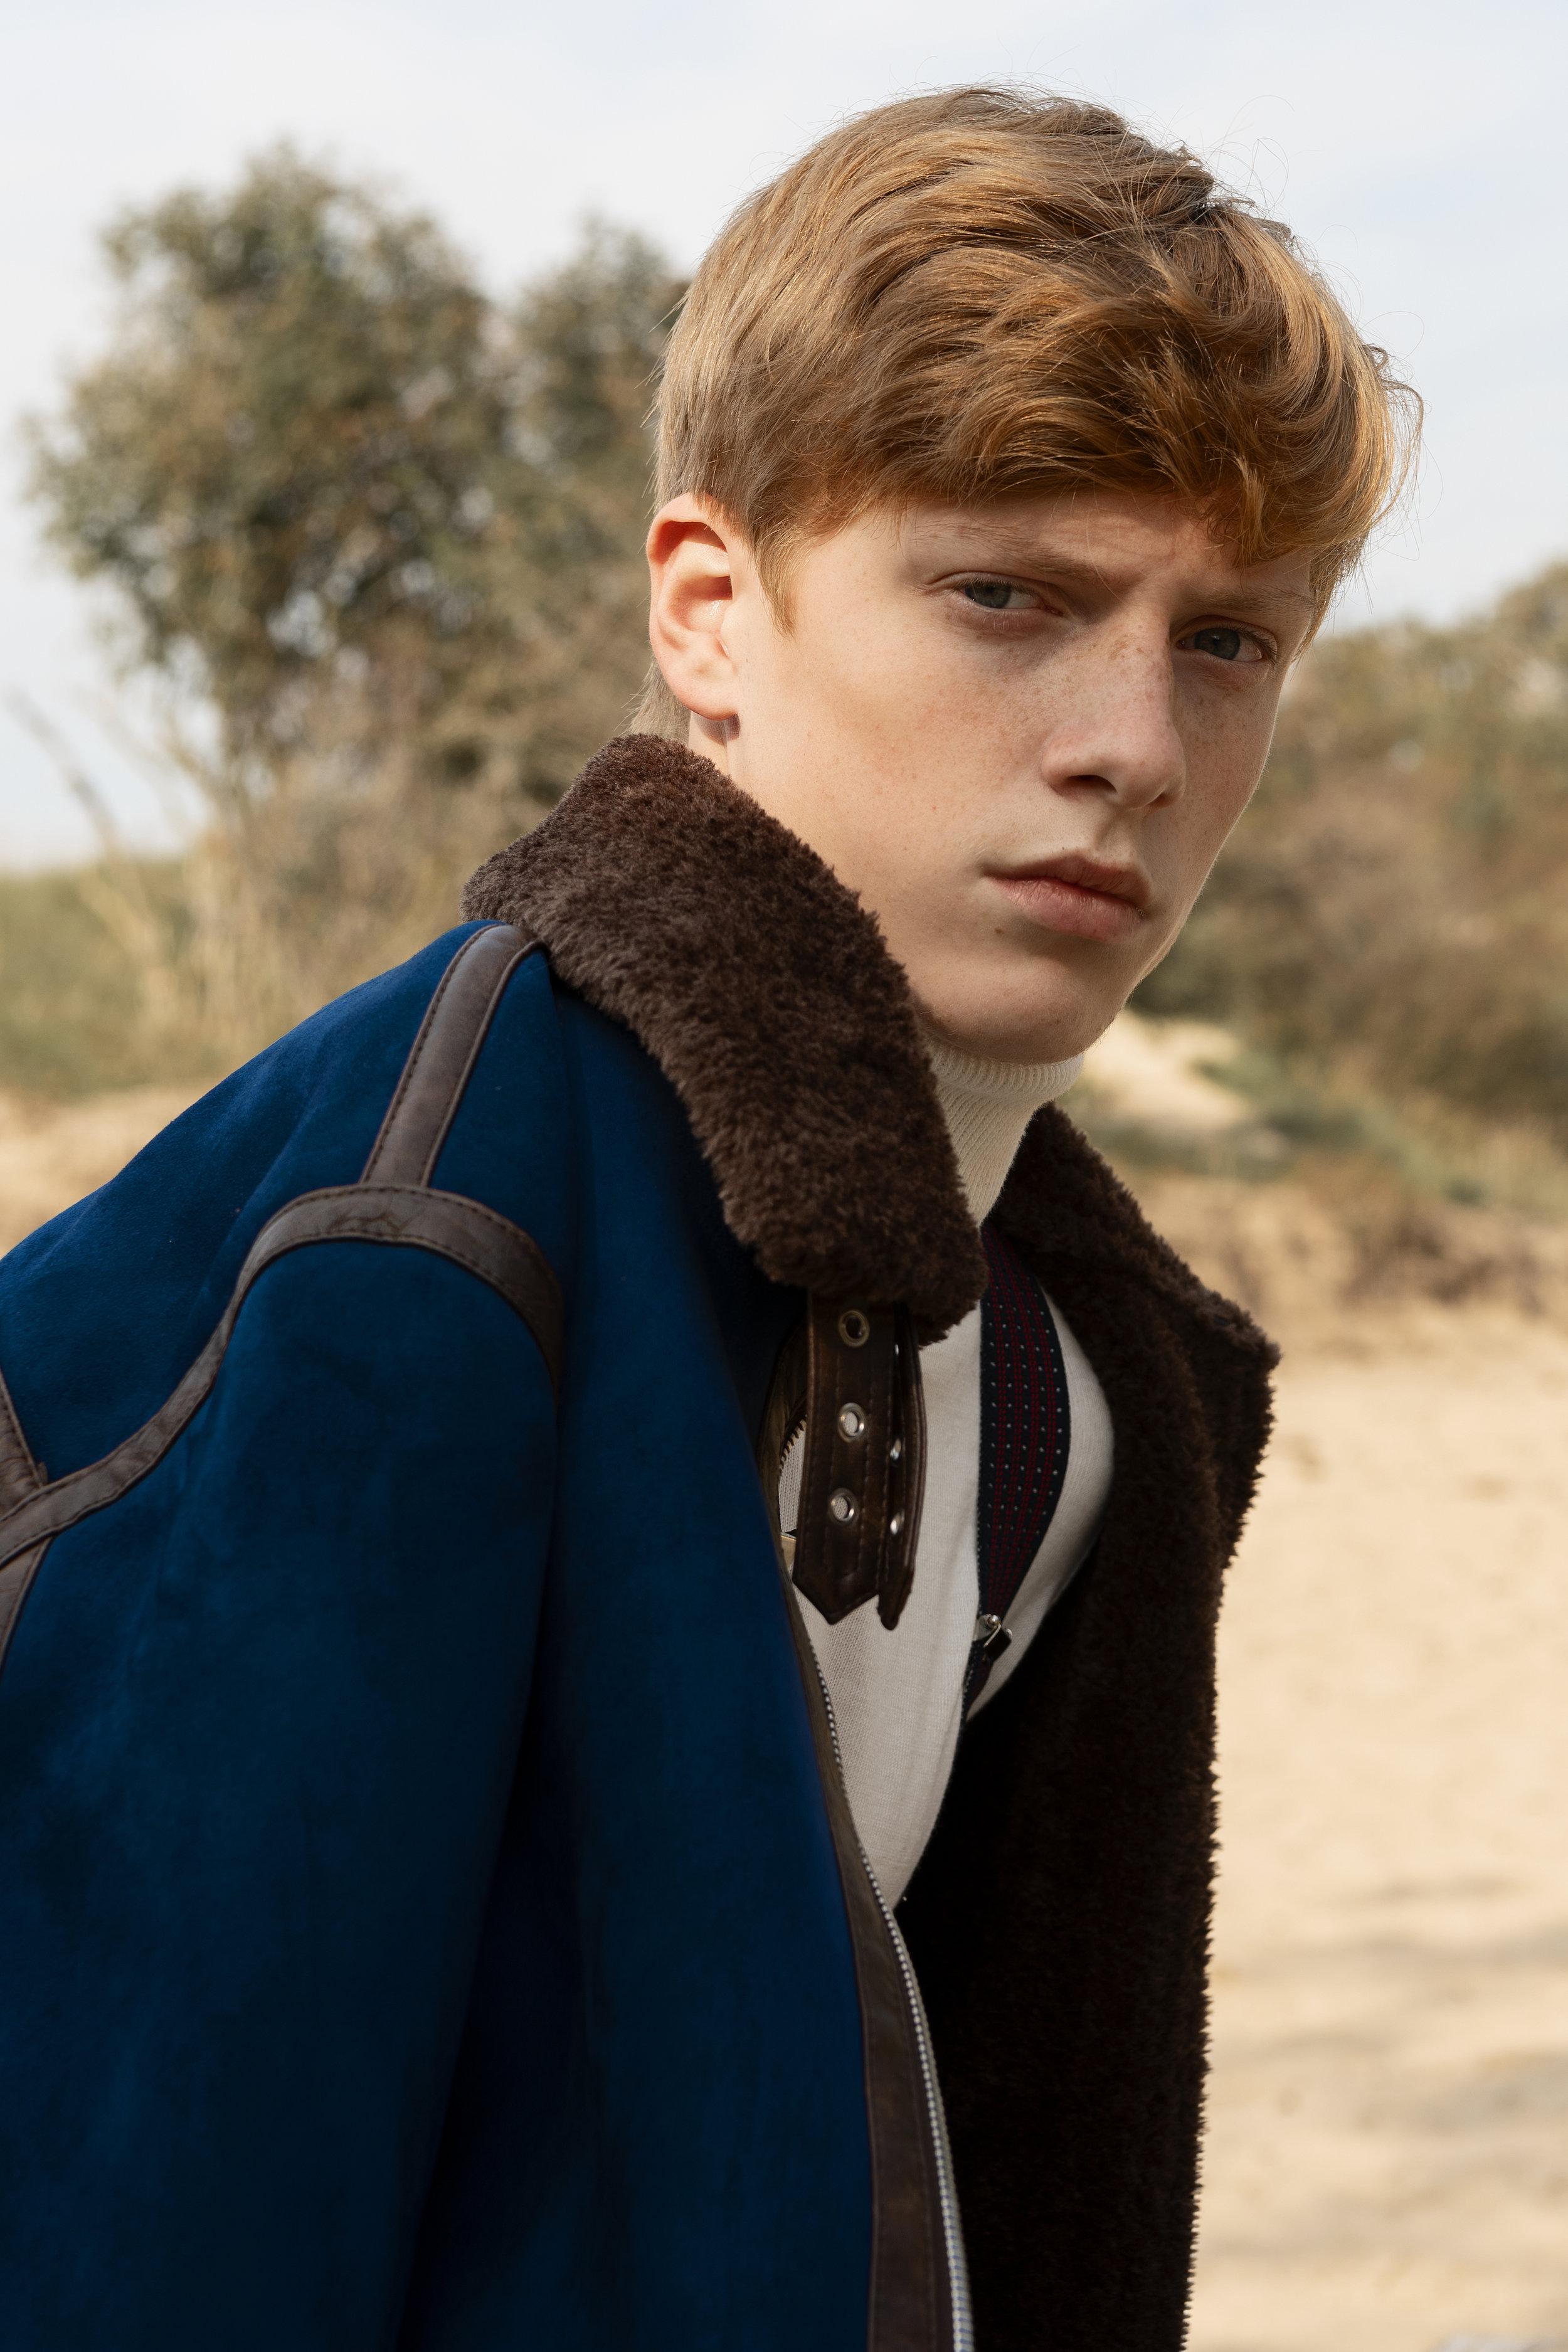 Turtle neck River Island, suspenders stylist wardrobe, jacket Zara.